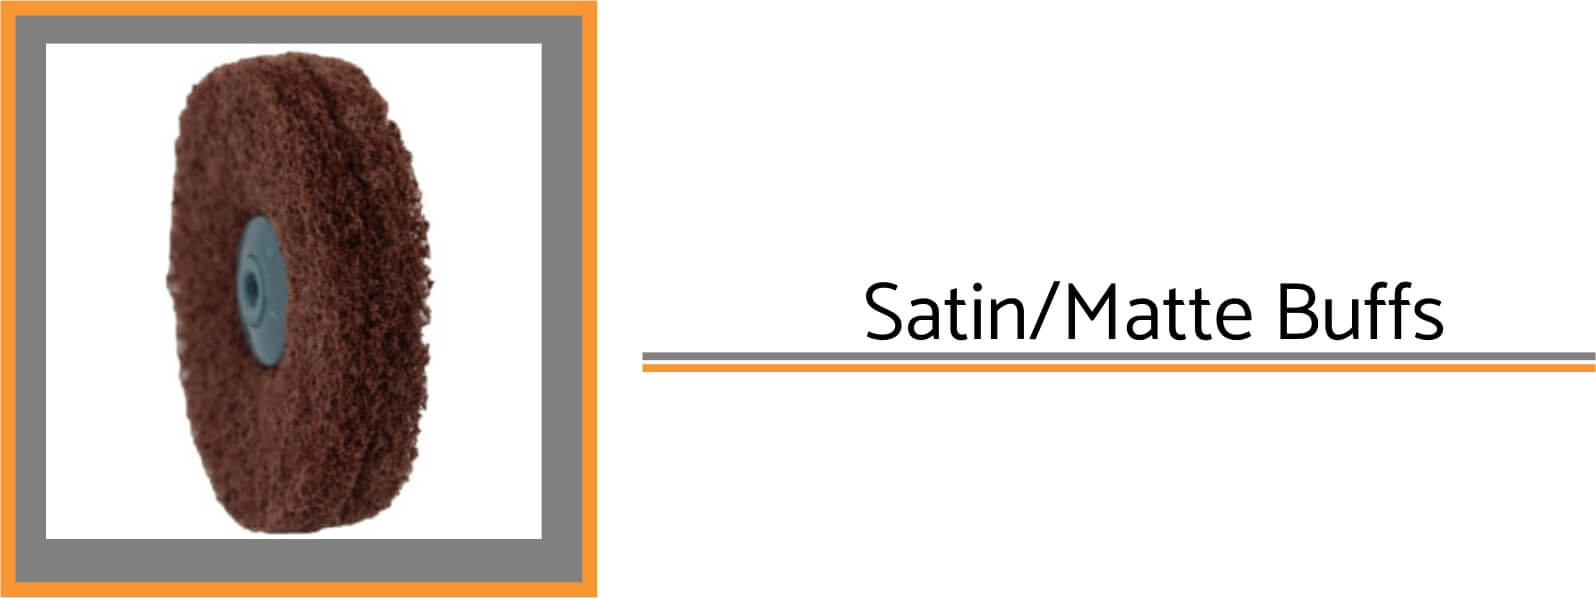 SatinMatte Buffs